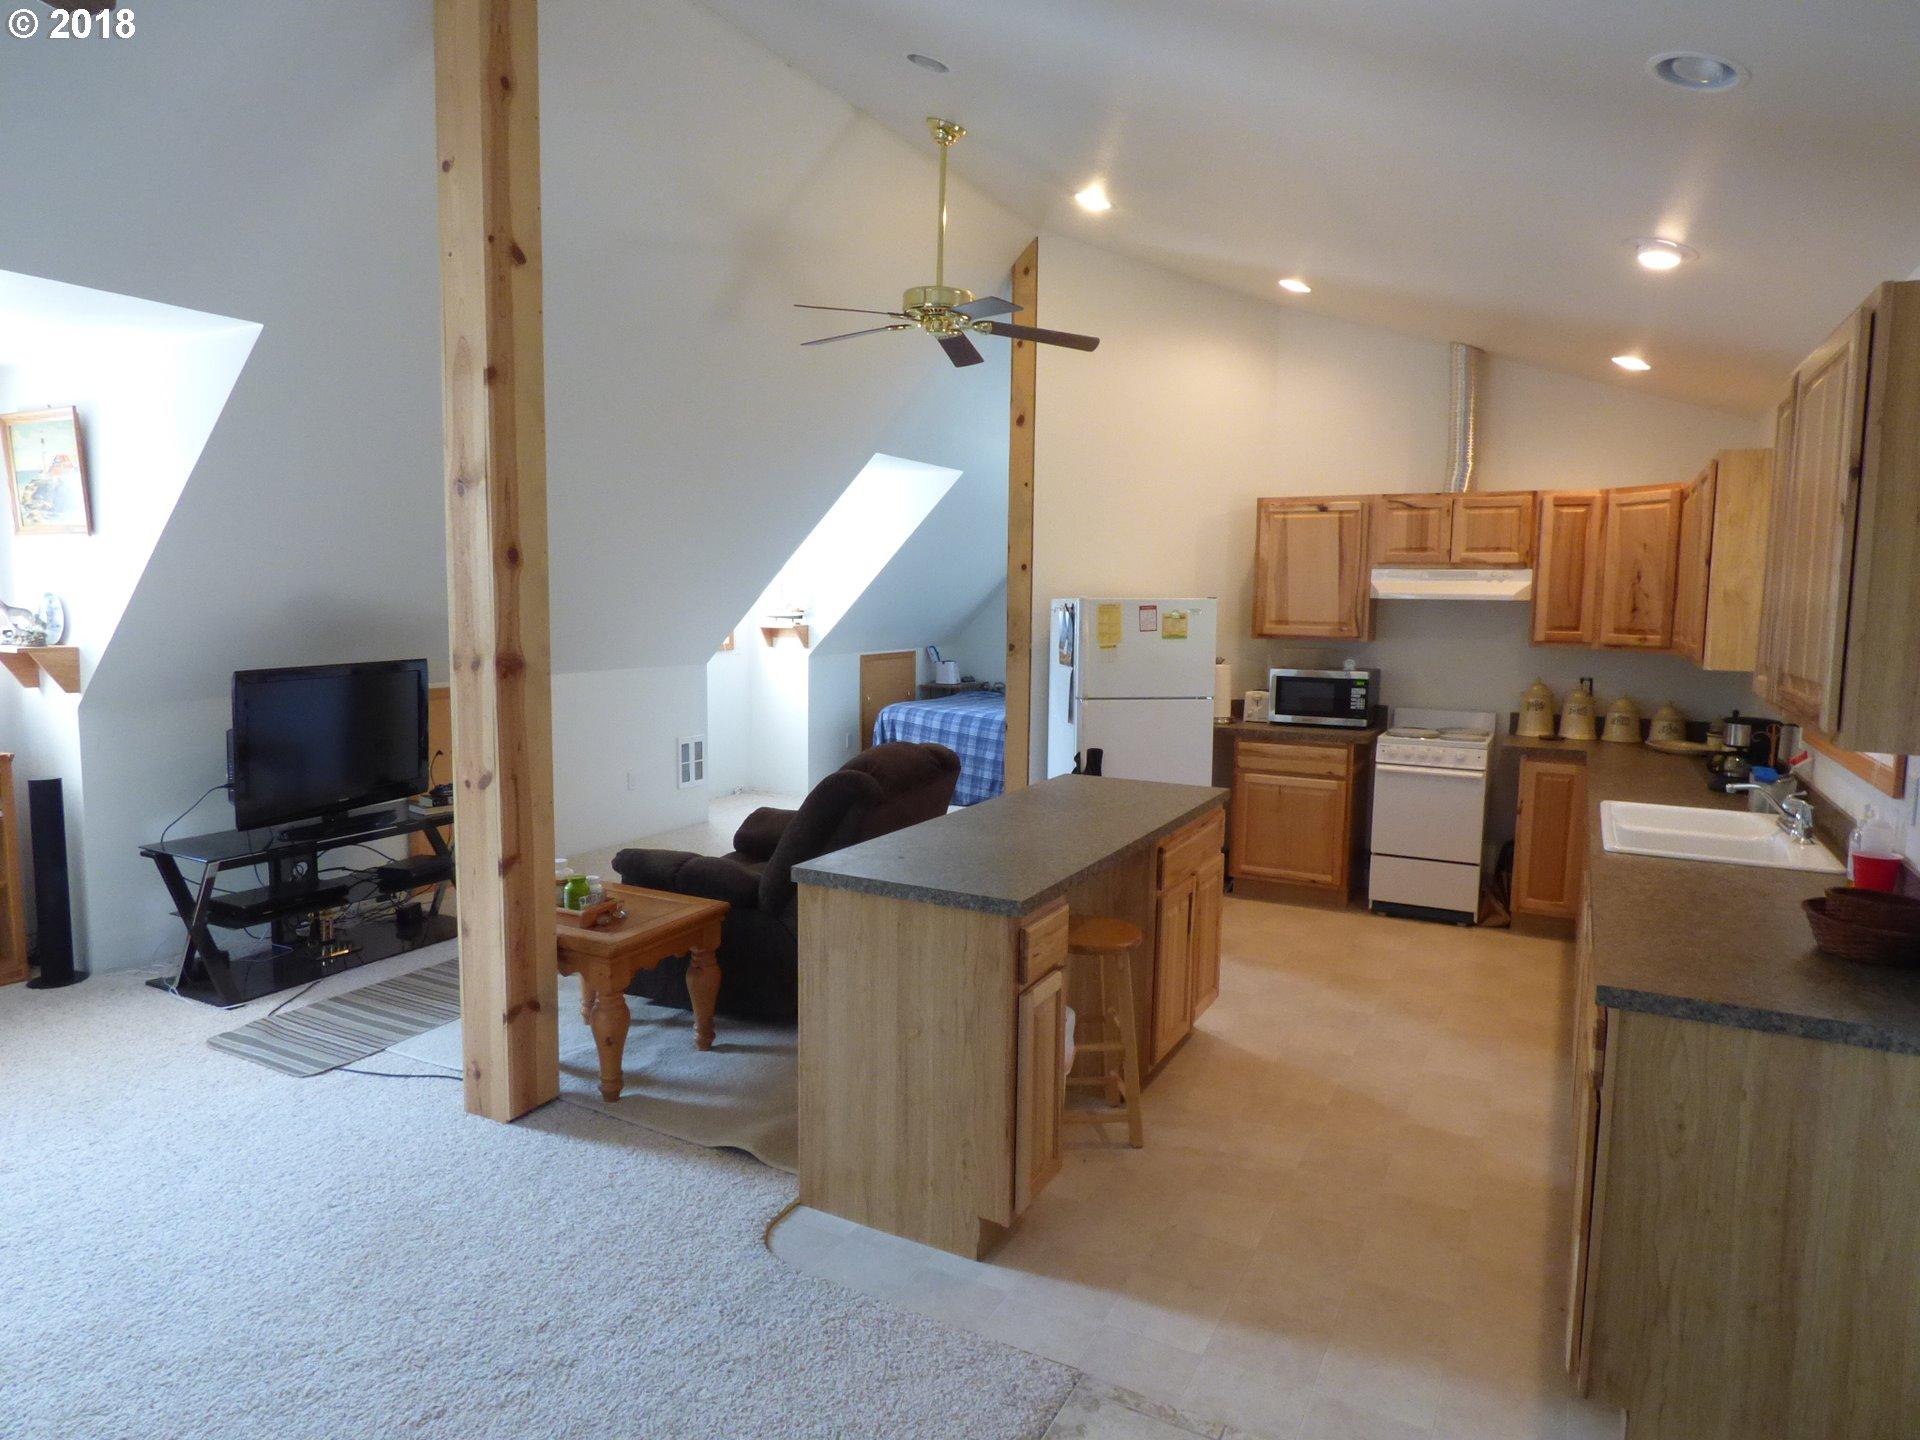 349 JUNIPER RD Goldendale, WA 98620 - MLS #: 18638272